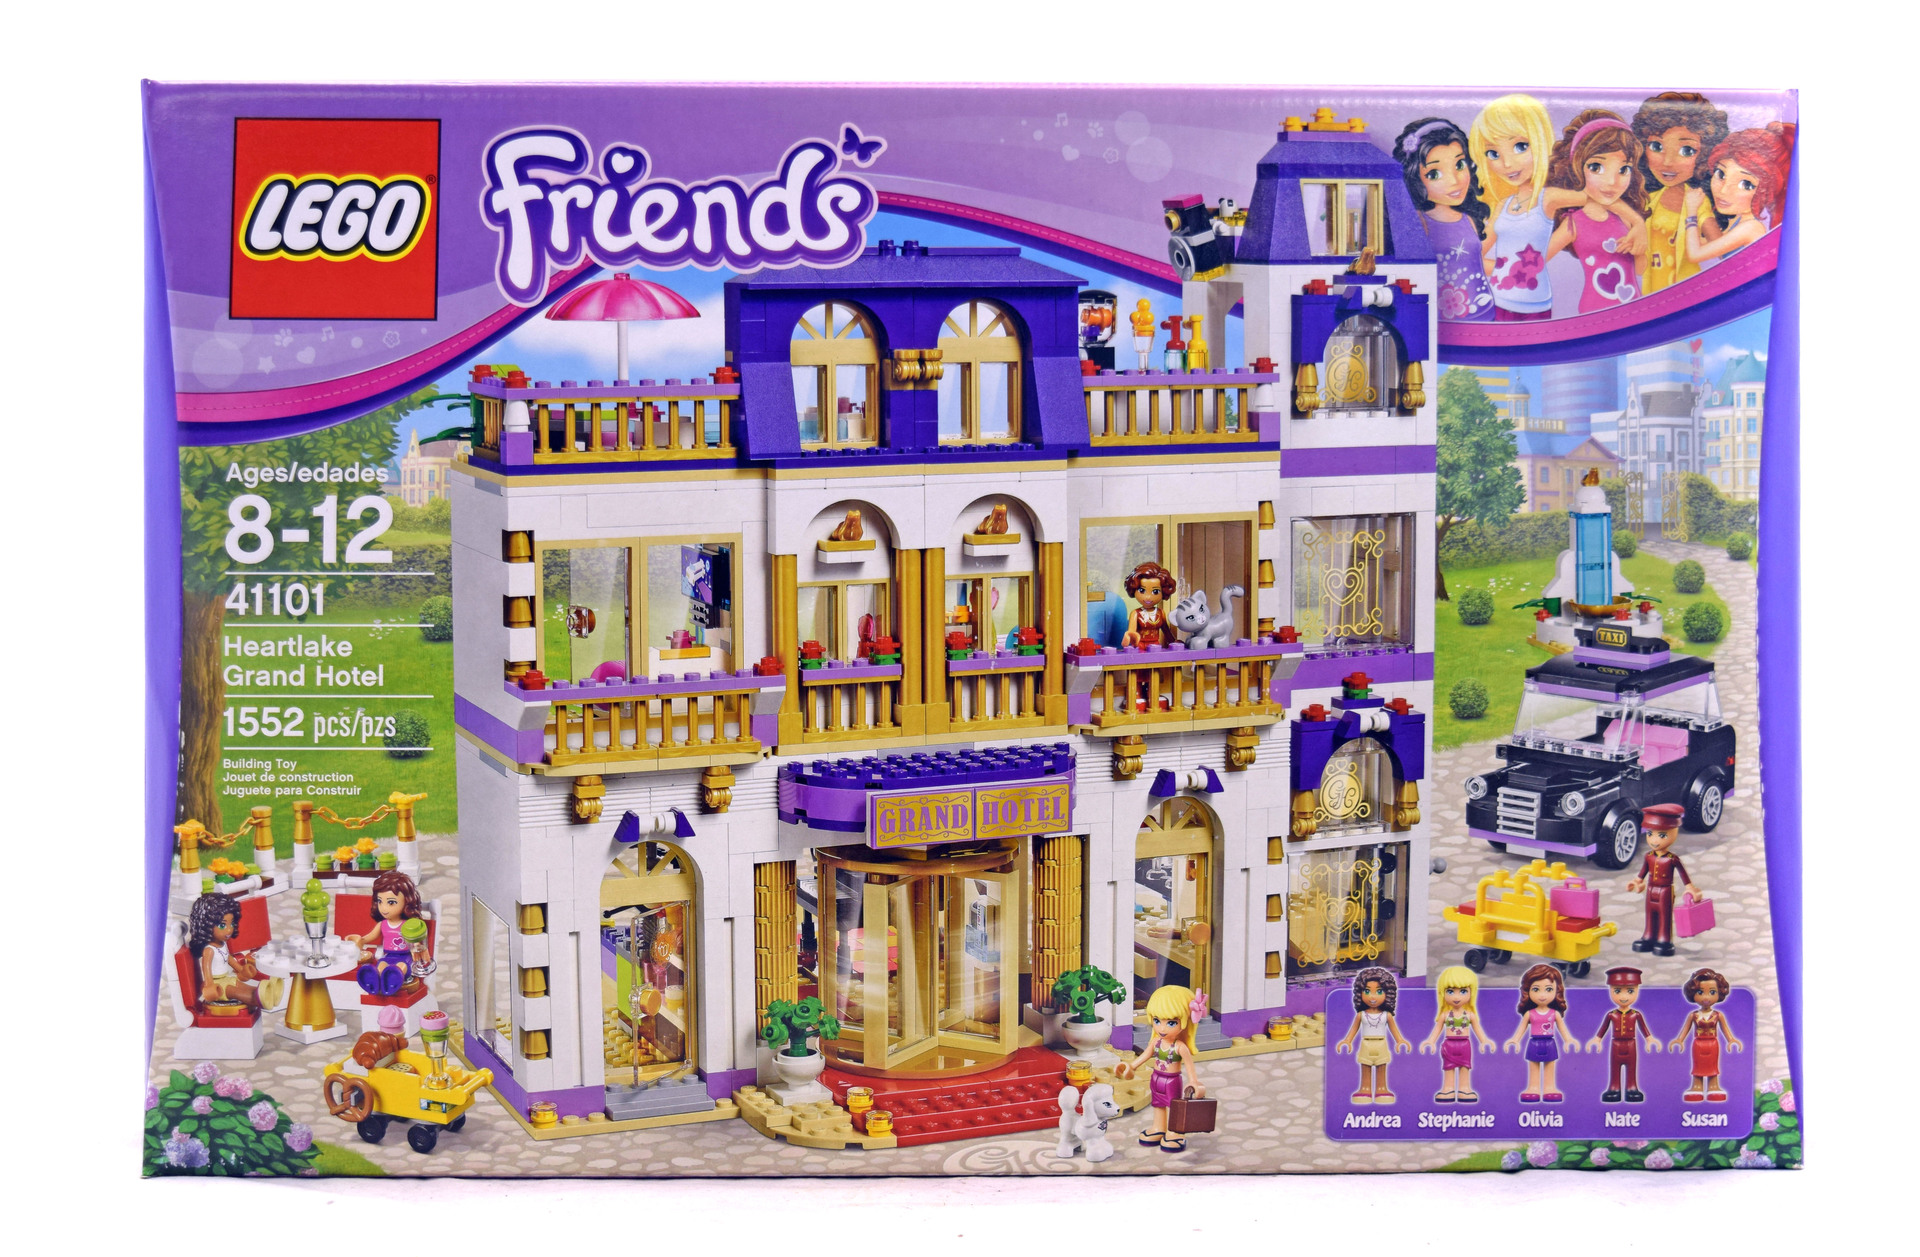 Heartlake Grand Hotel - LEGO set #41101-1 (NISB) (Building ...